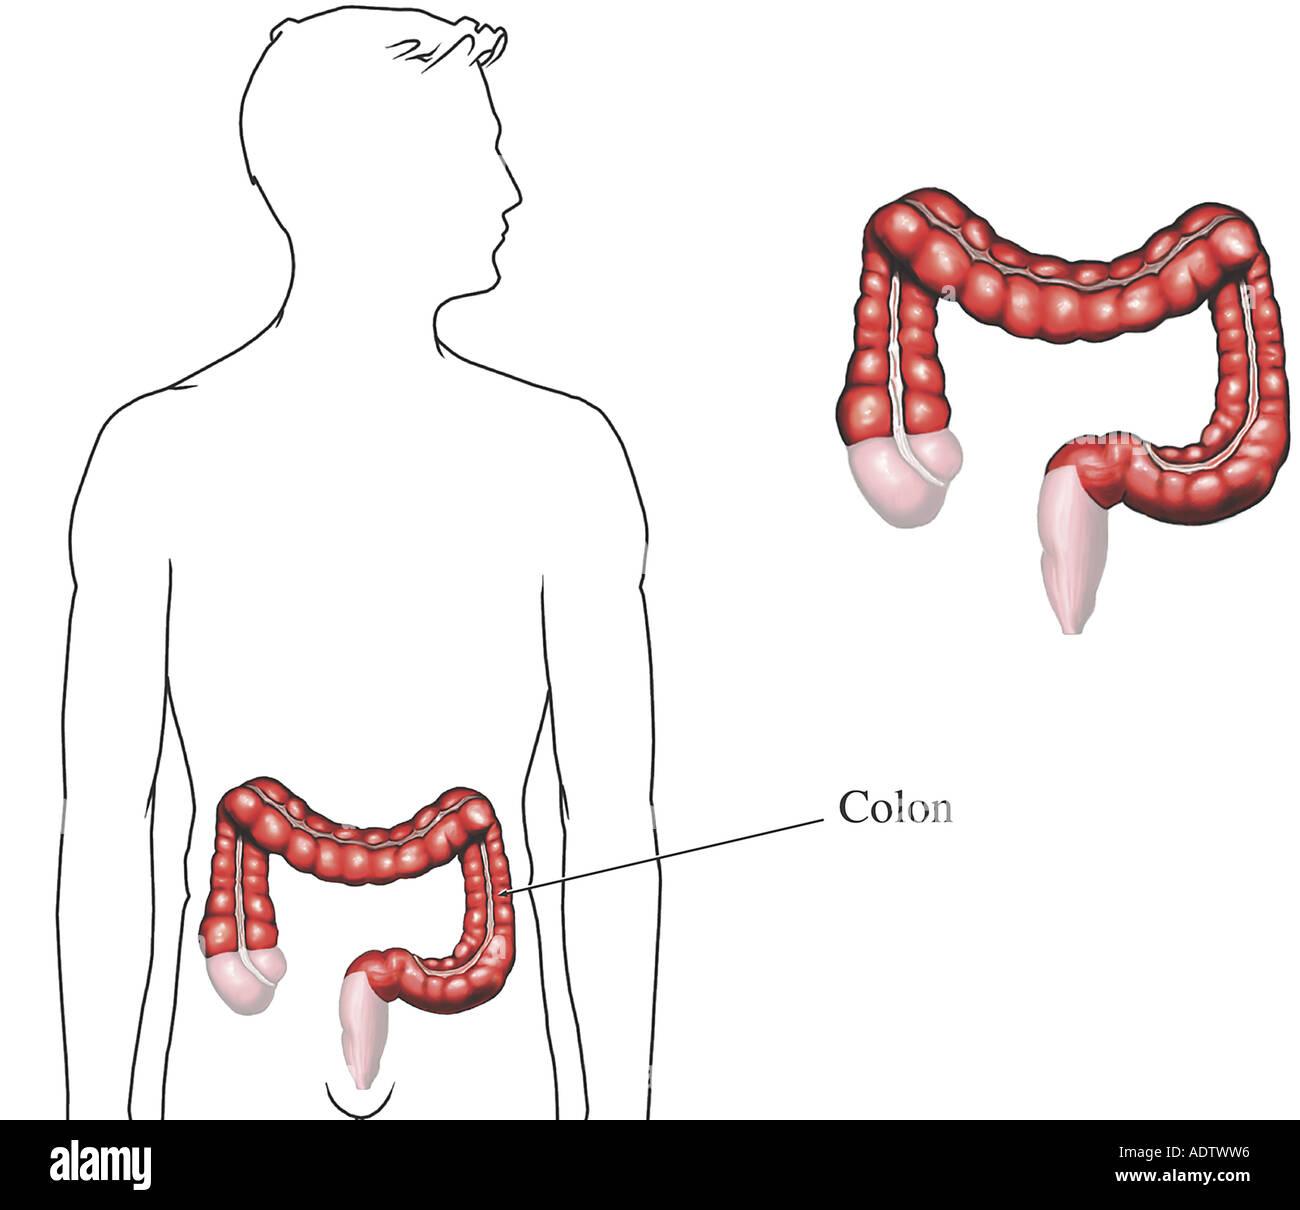 Anatomie des Colon (Dickdarm Stockfoto, Bild: 7710549 - Alamy